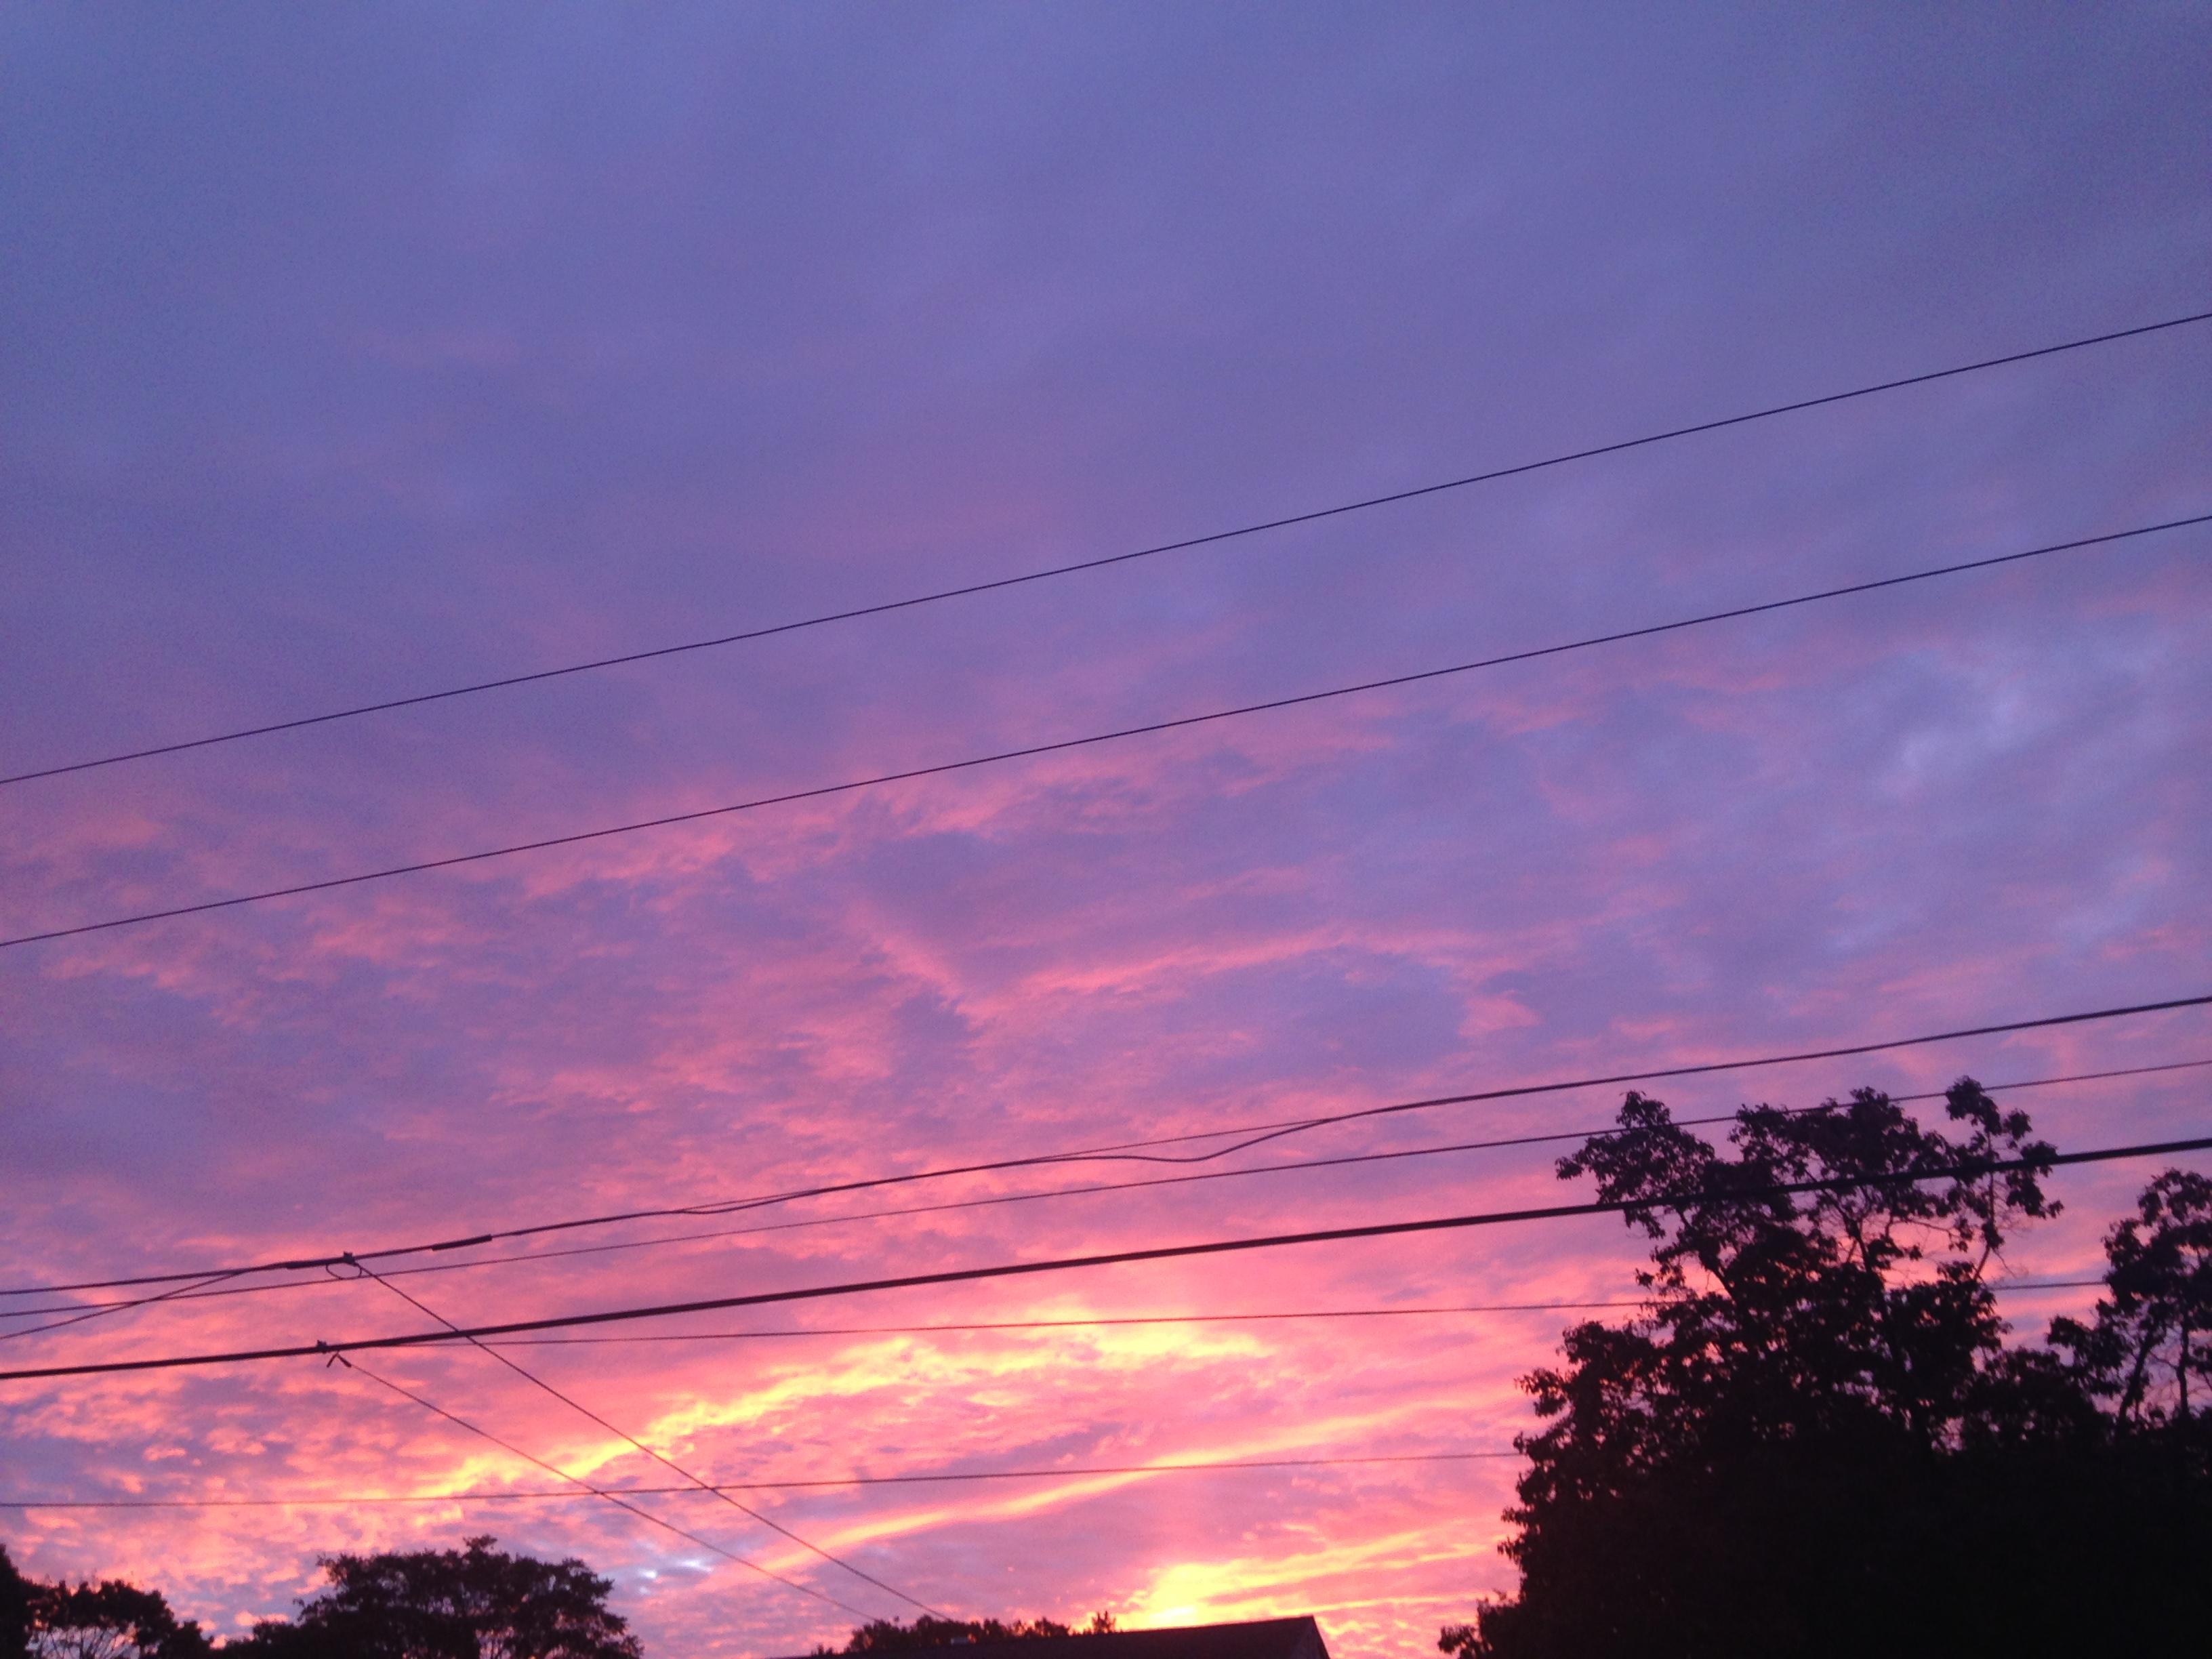 Sunrise, National Park, NJ